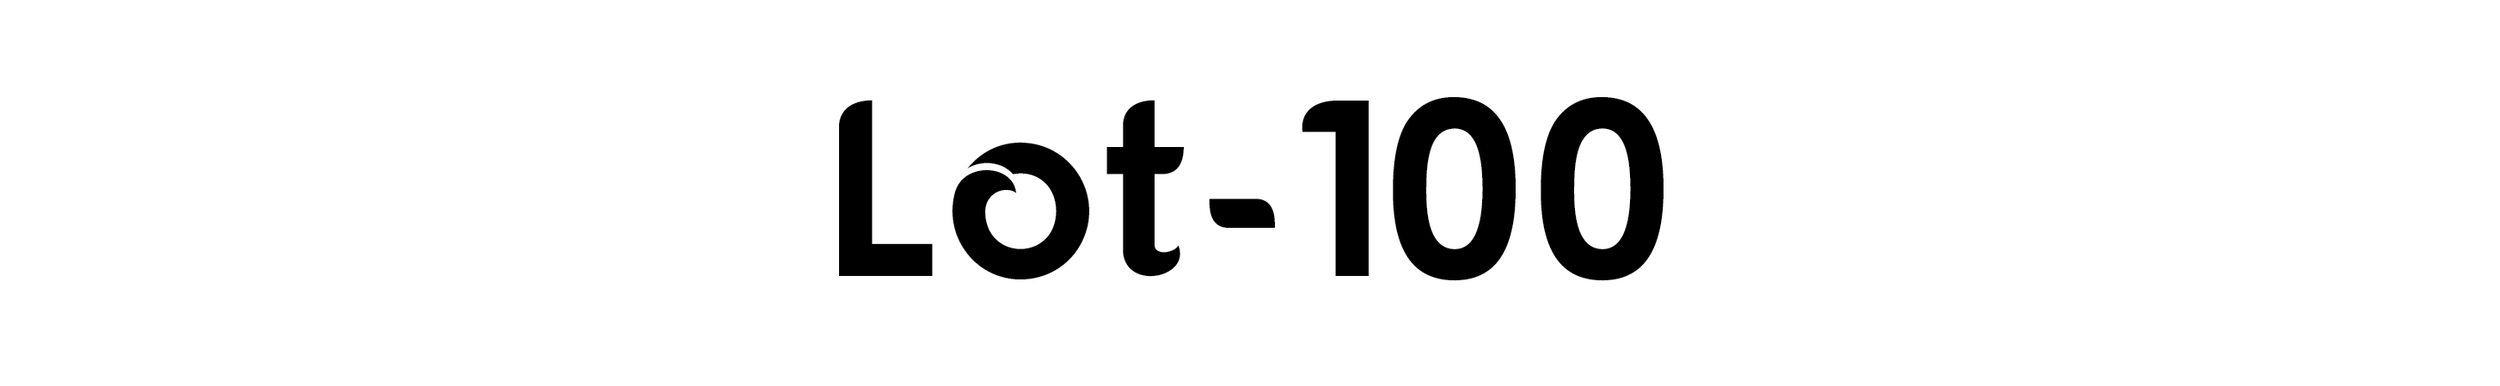 Lot100.jpg